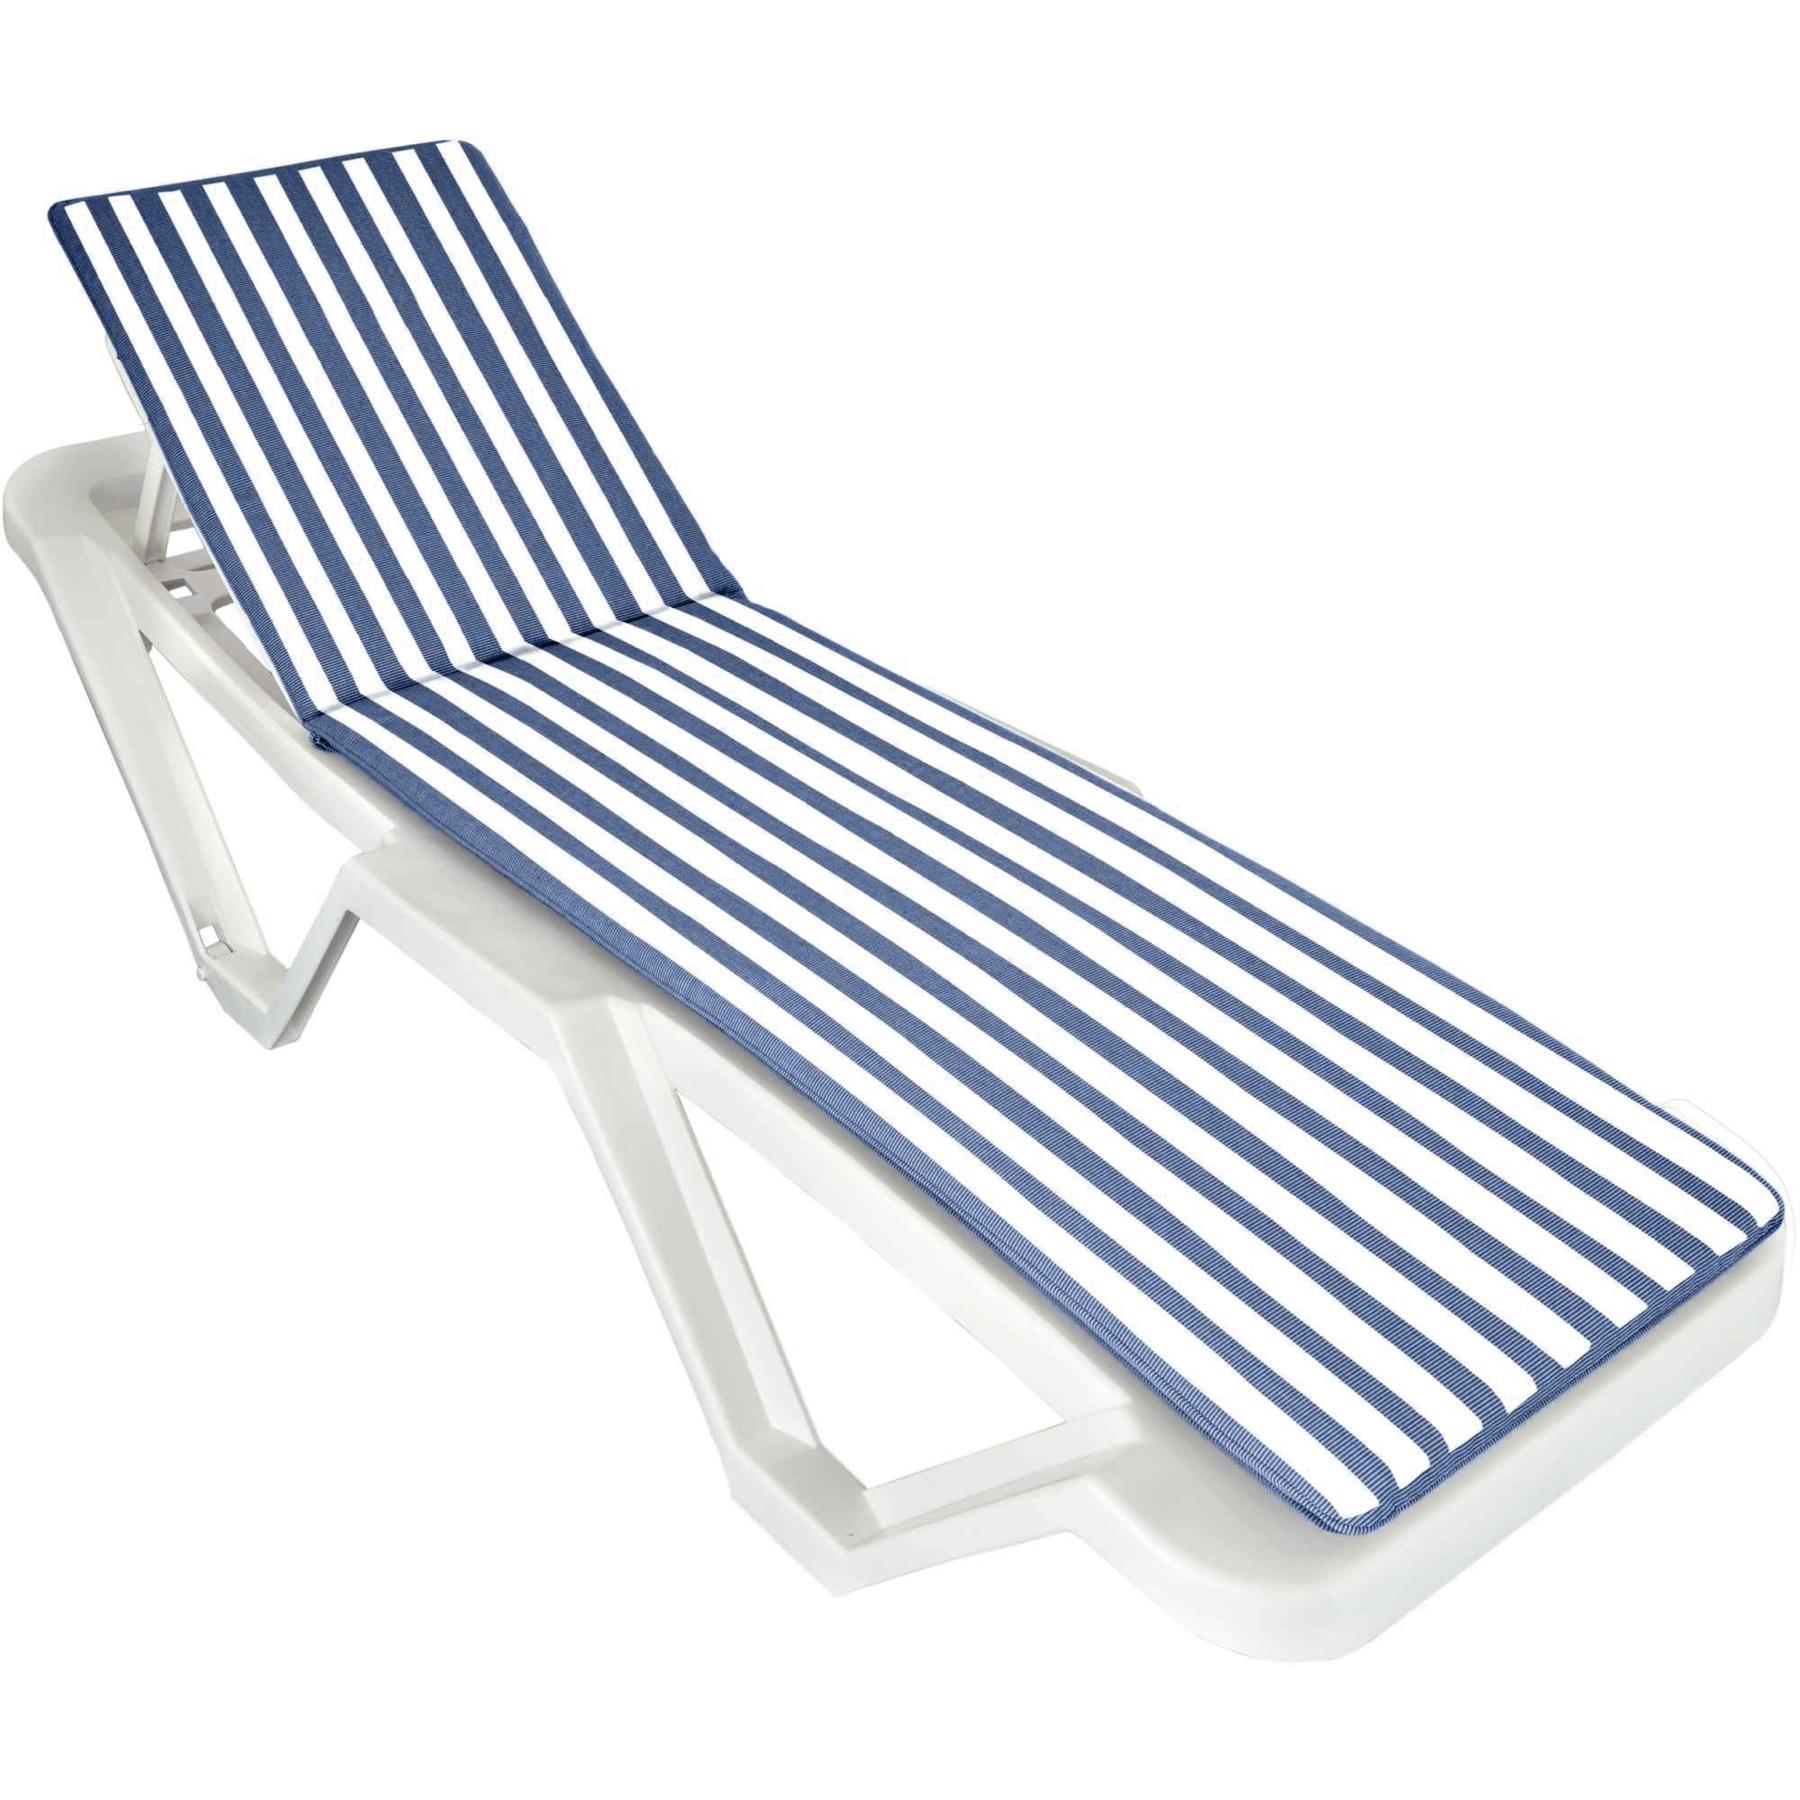 Blue White Sunlounger Cushion Pad For Sun Lounger Garden